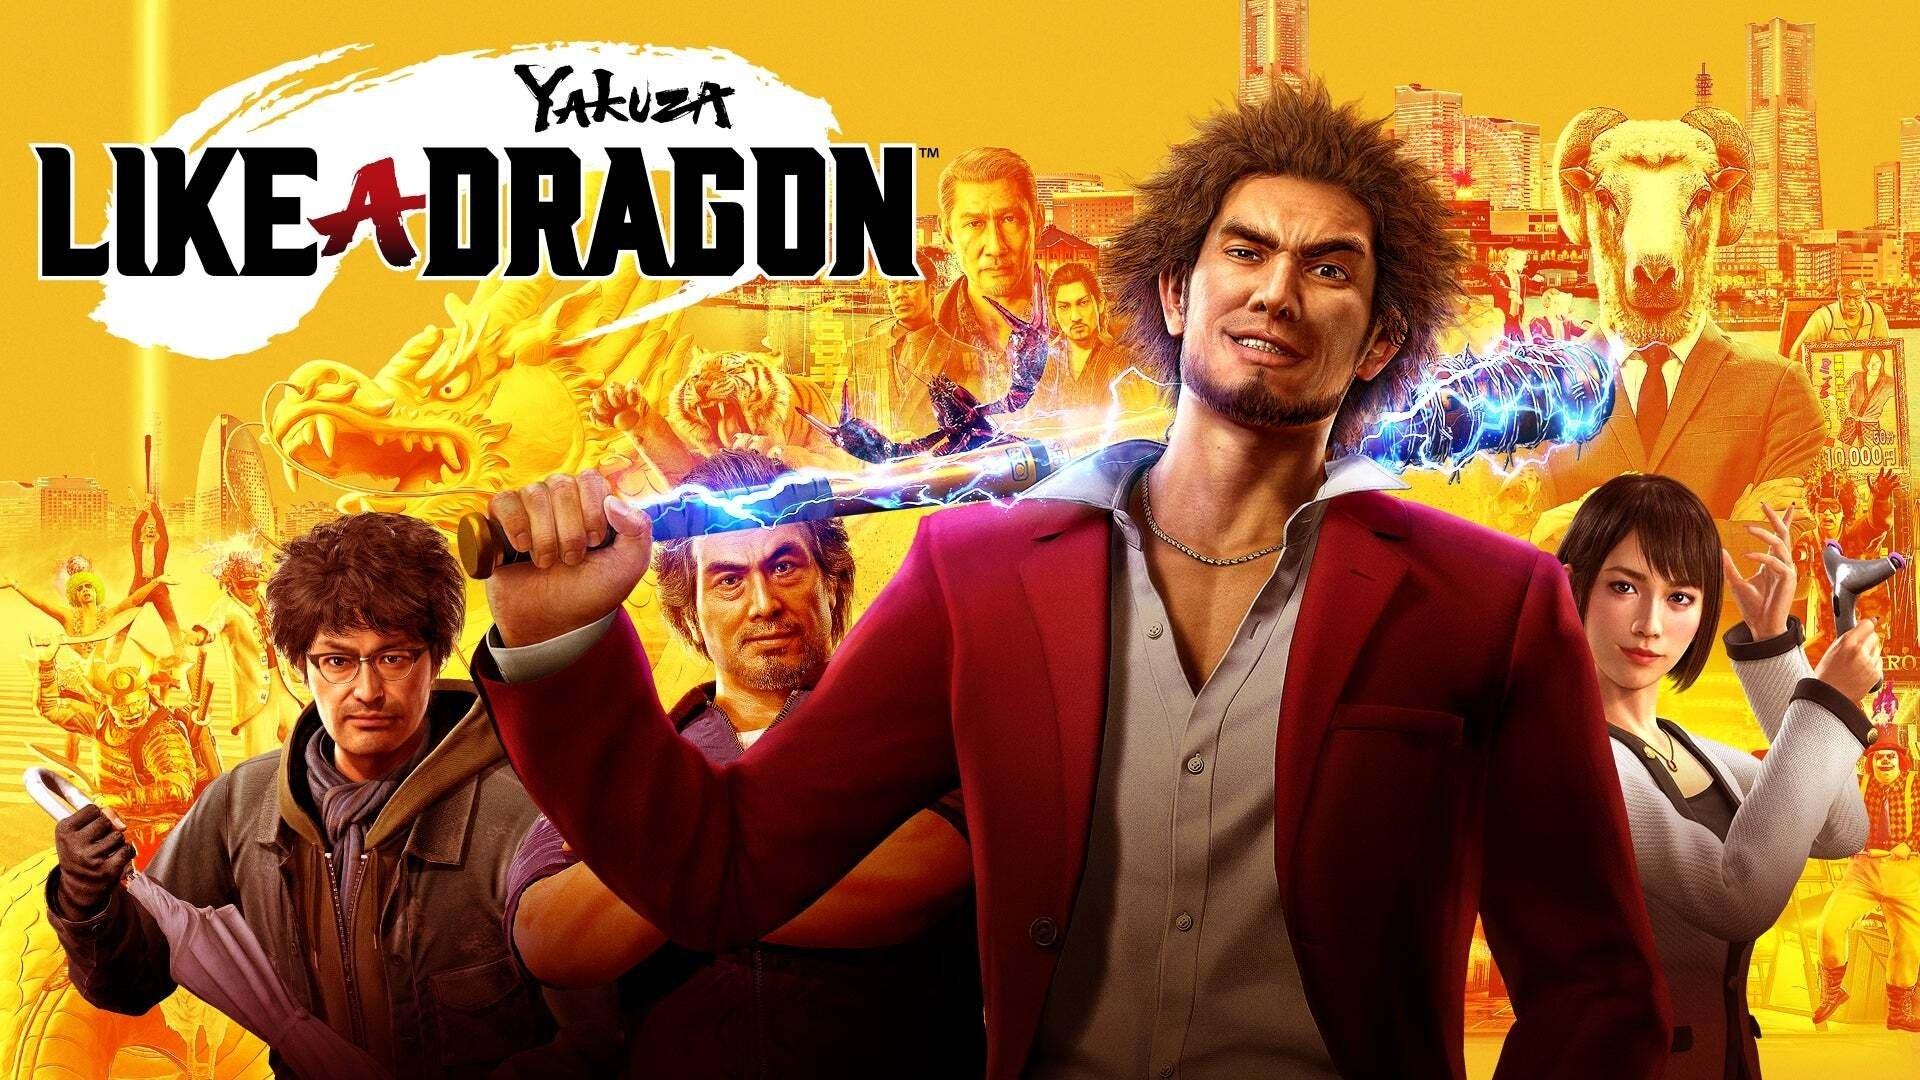 Promo poster of Yakuza: Like a Dragon. (Image credit: SEGA)